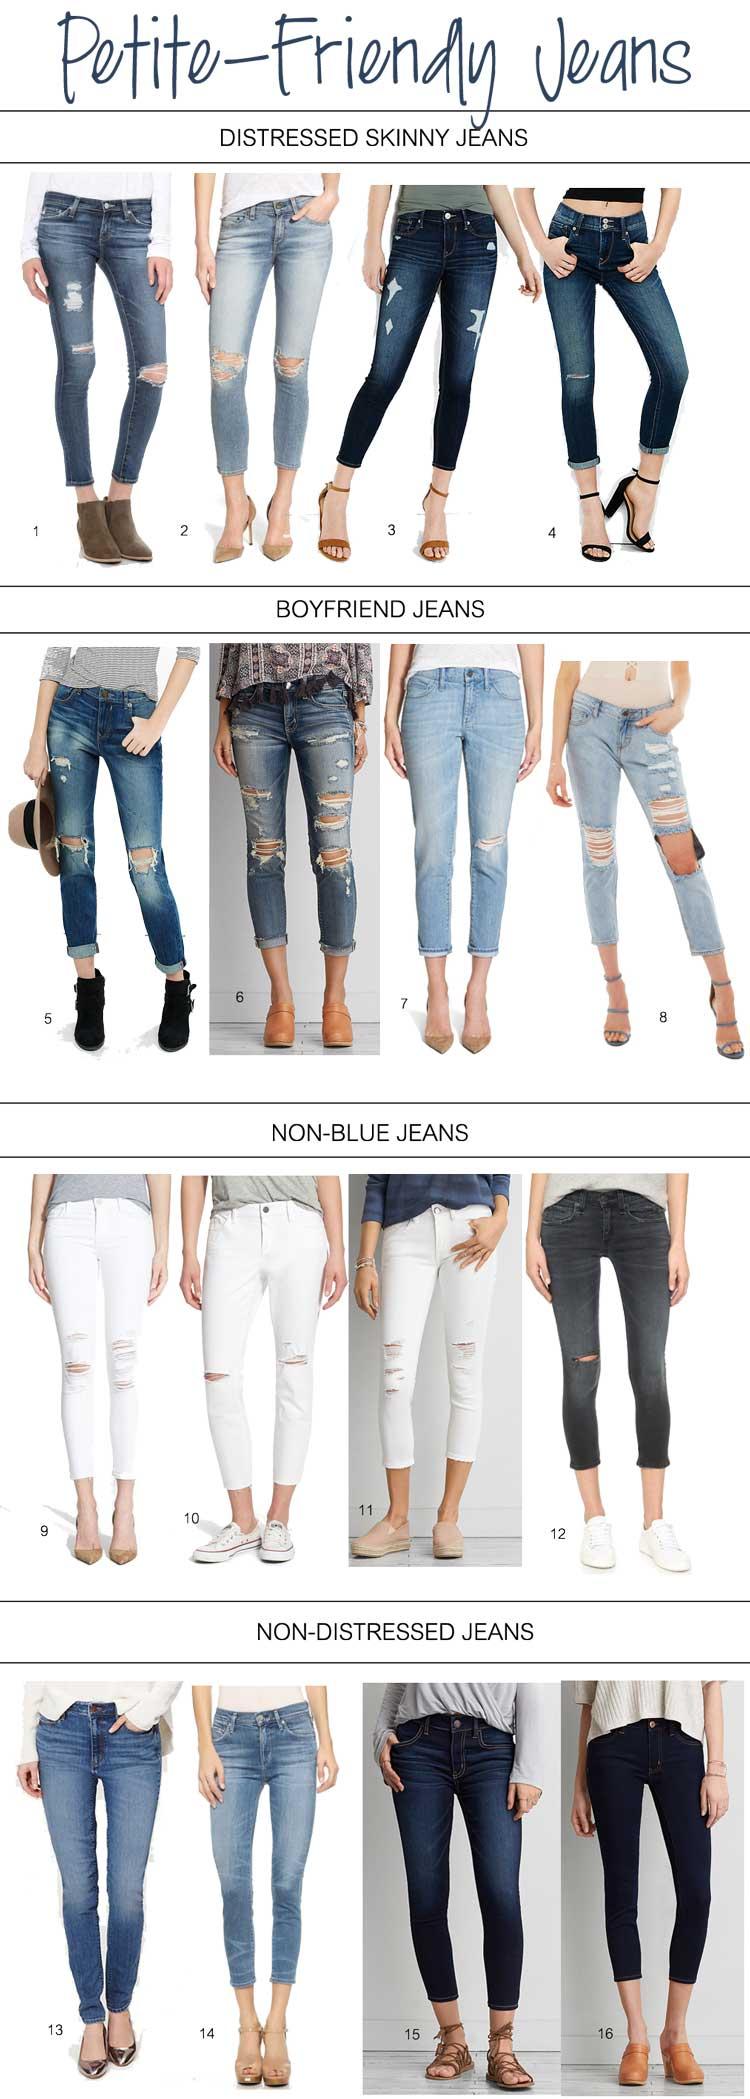 petite friendly jeans - distressed, skinny, boyfriend